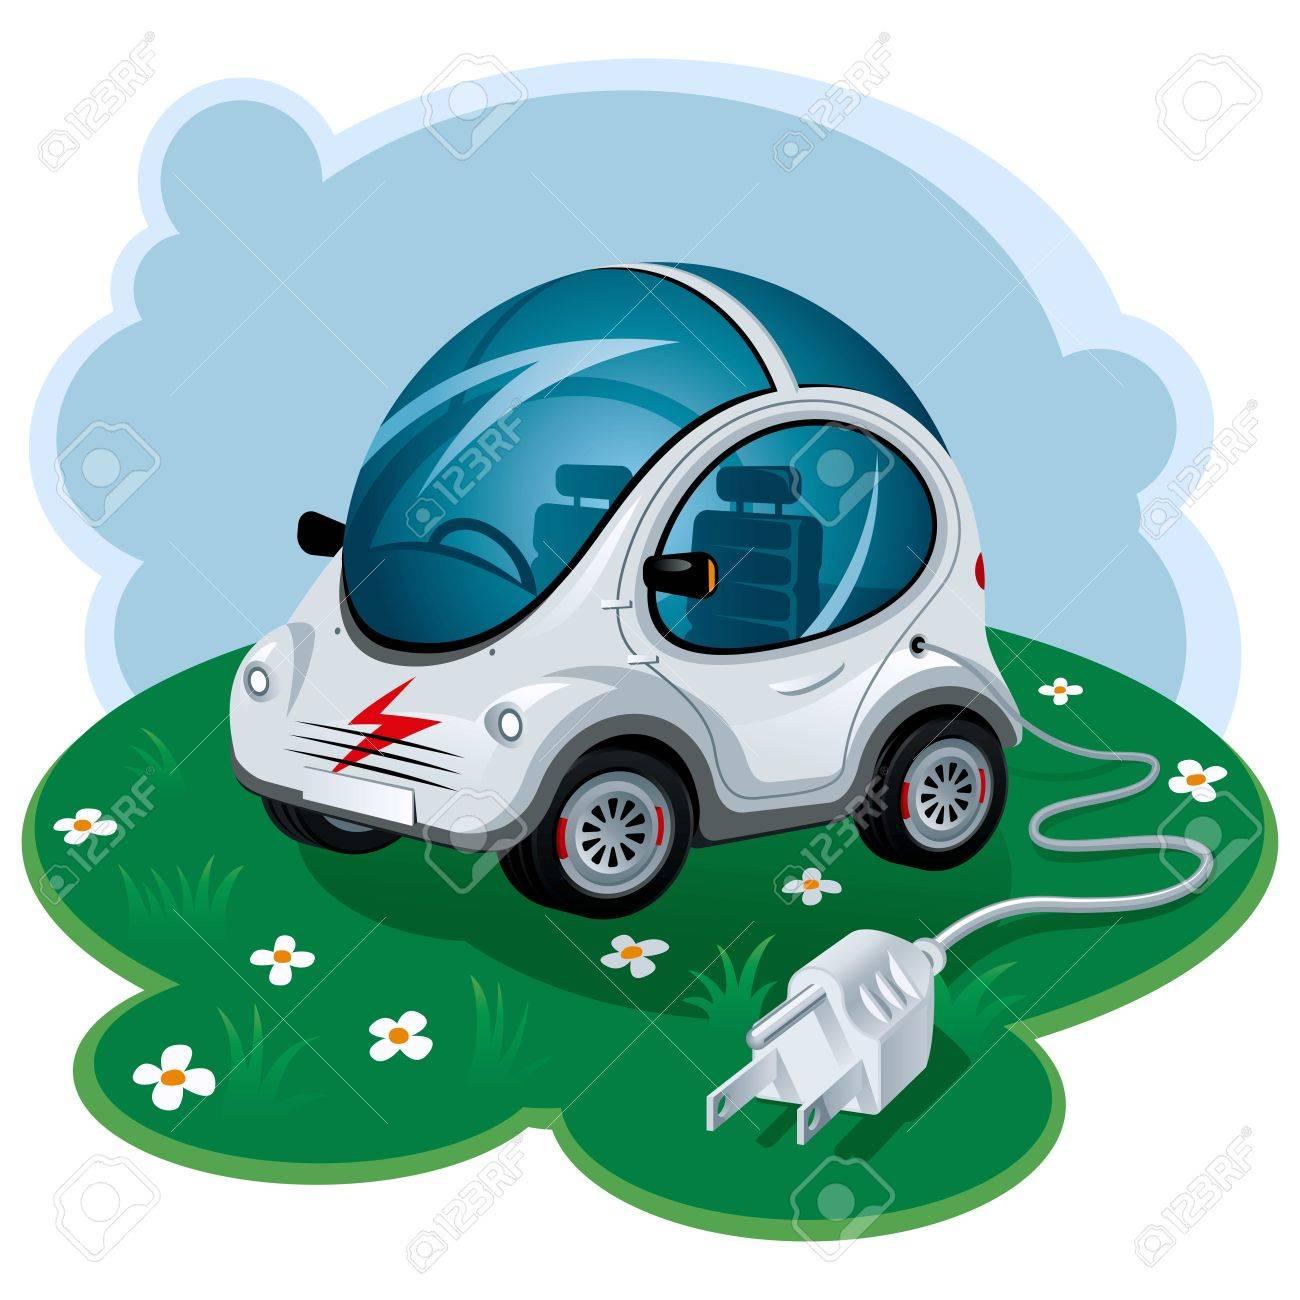 Green Energy Car. Vector Illustration Stock Vector - 9327732